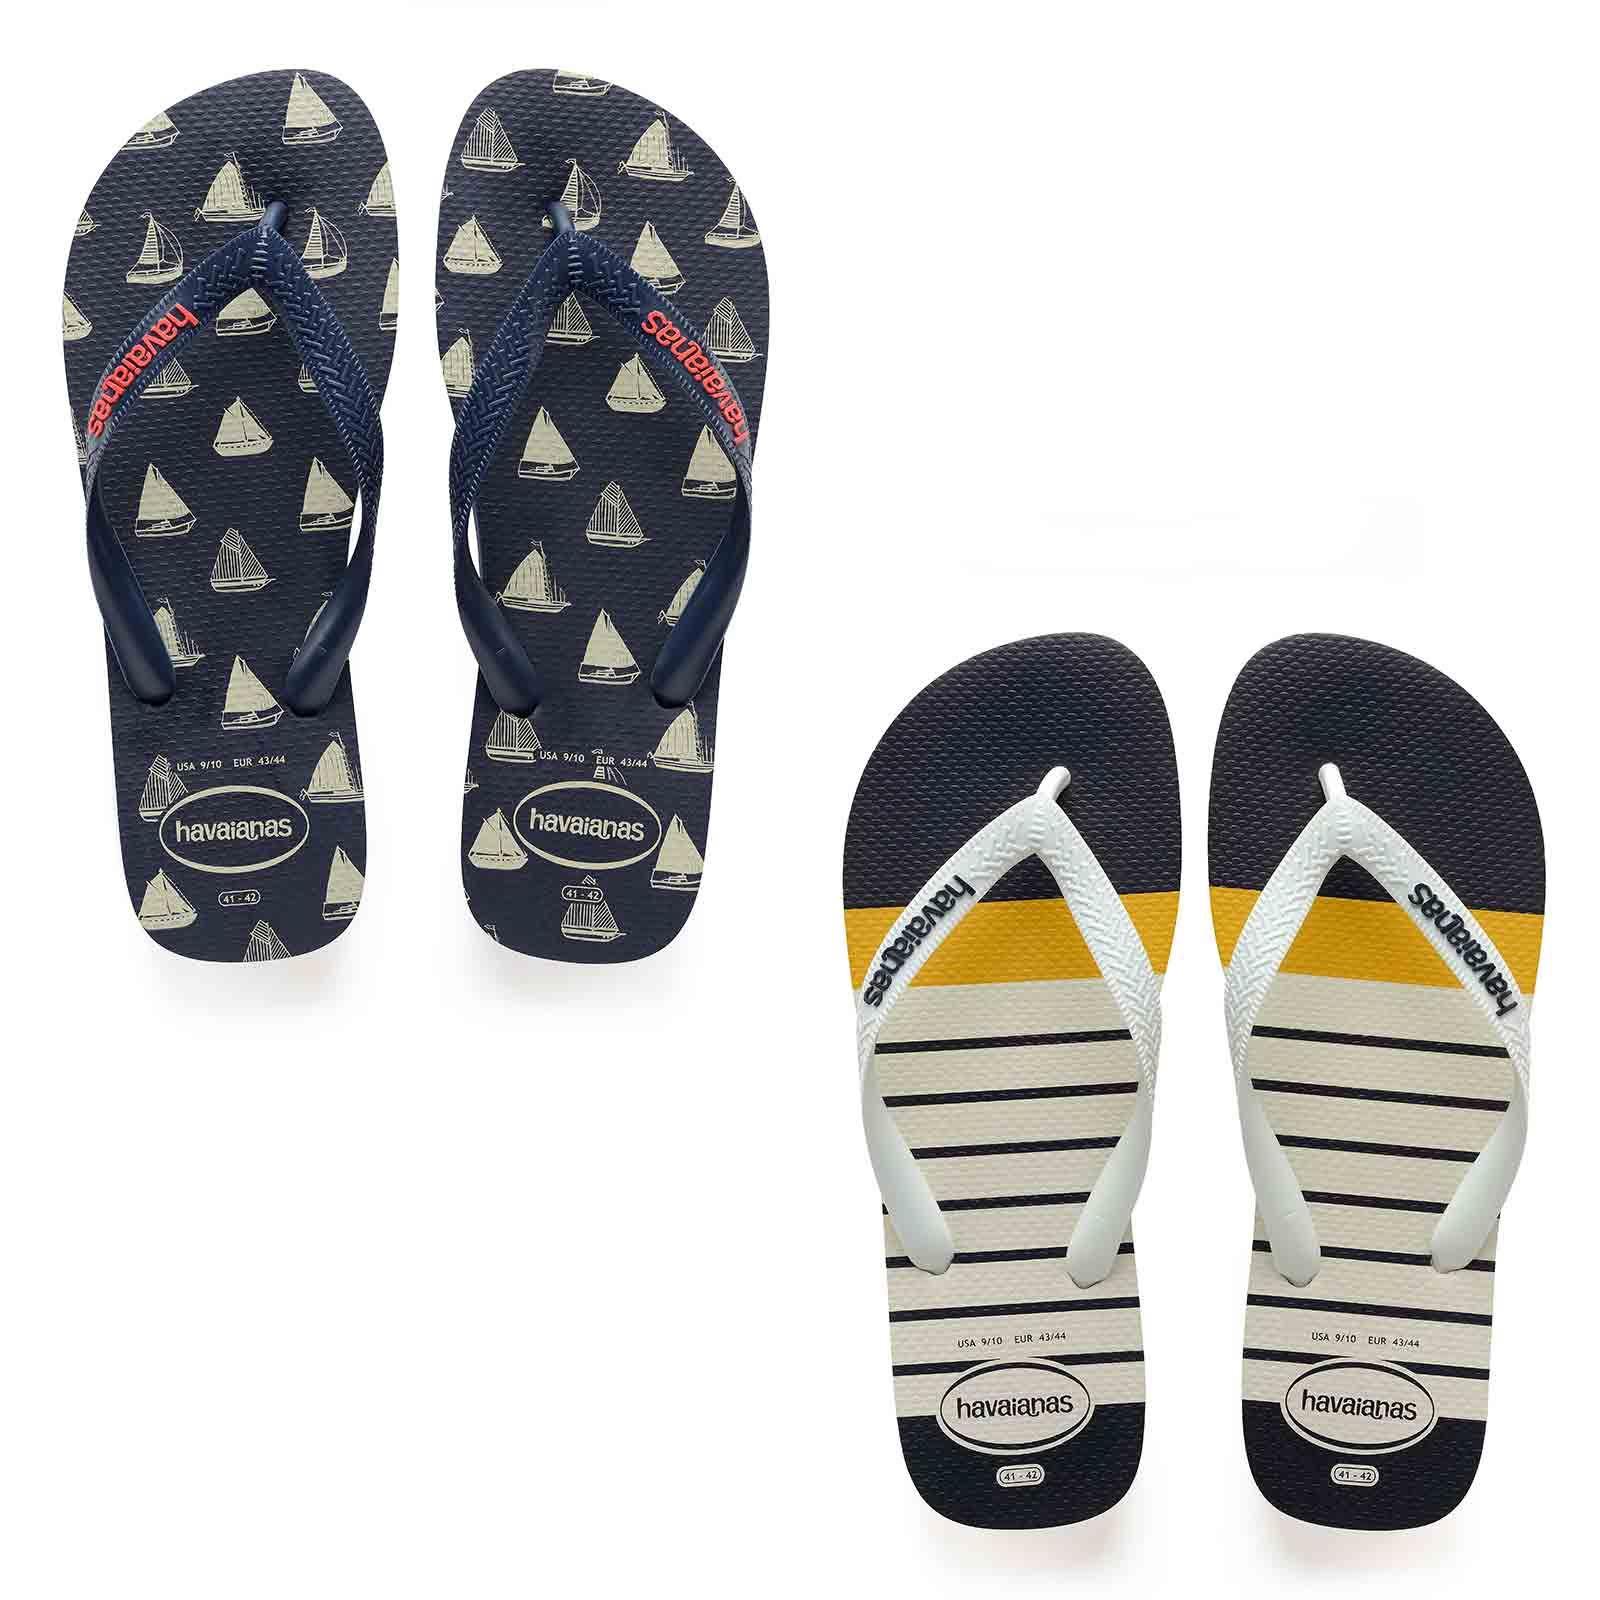 Mens Flip Flops White Havaianas Top Nautical Flip Flops